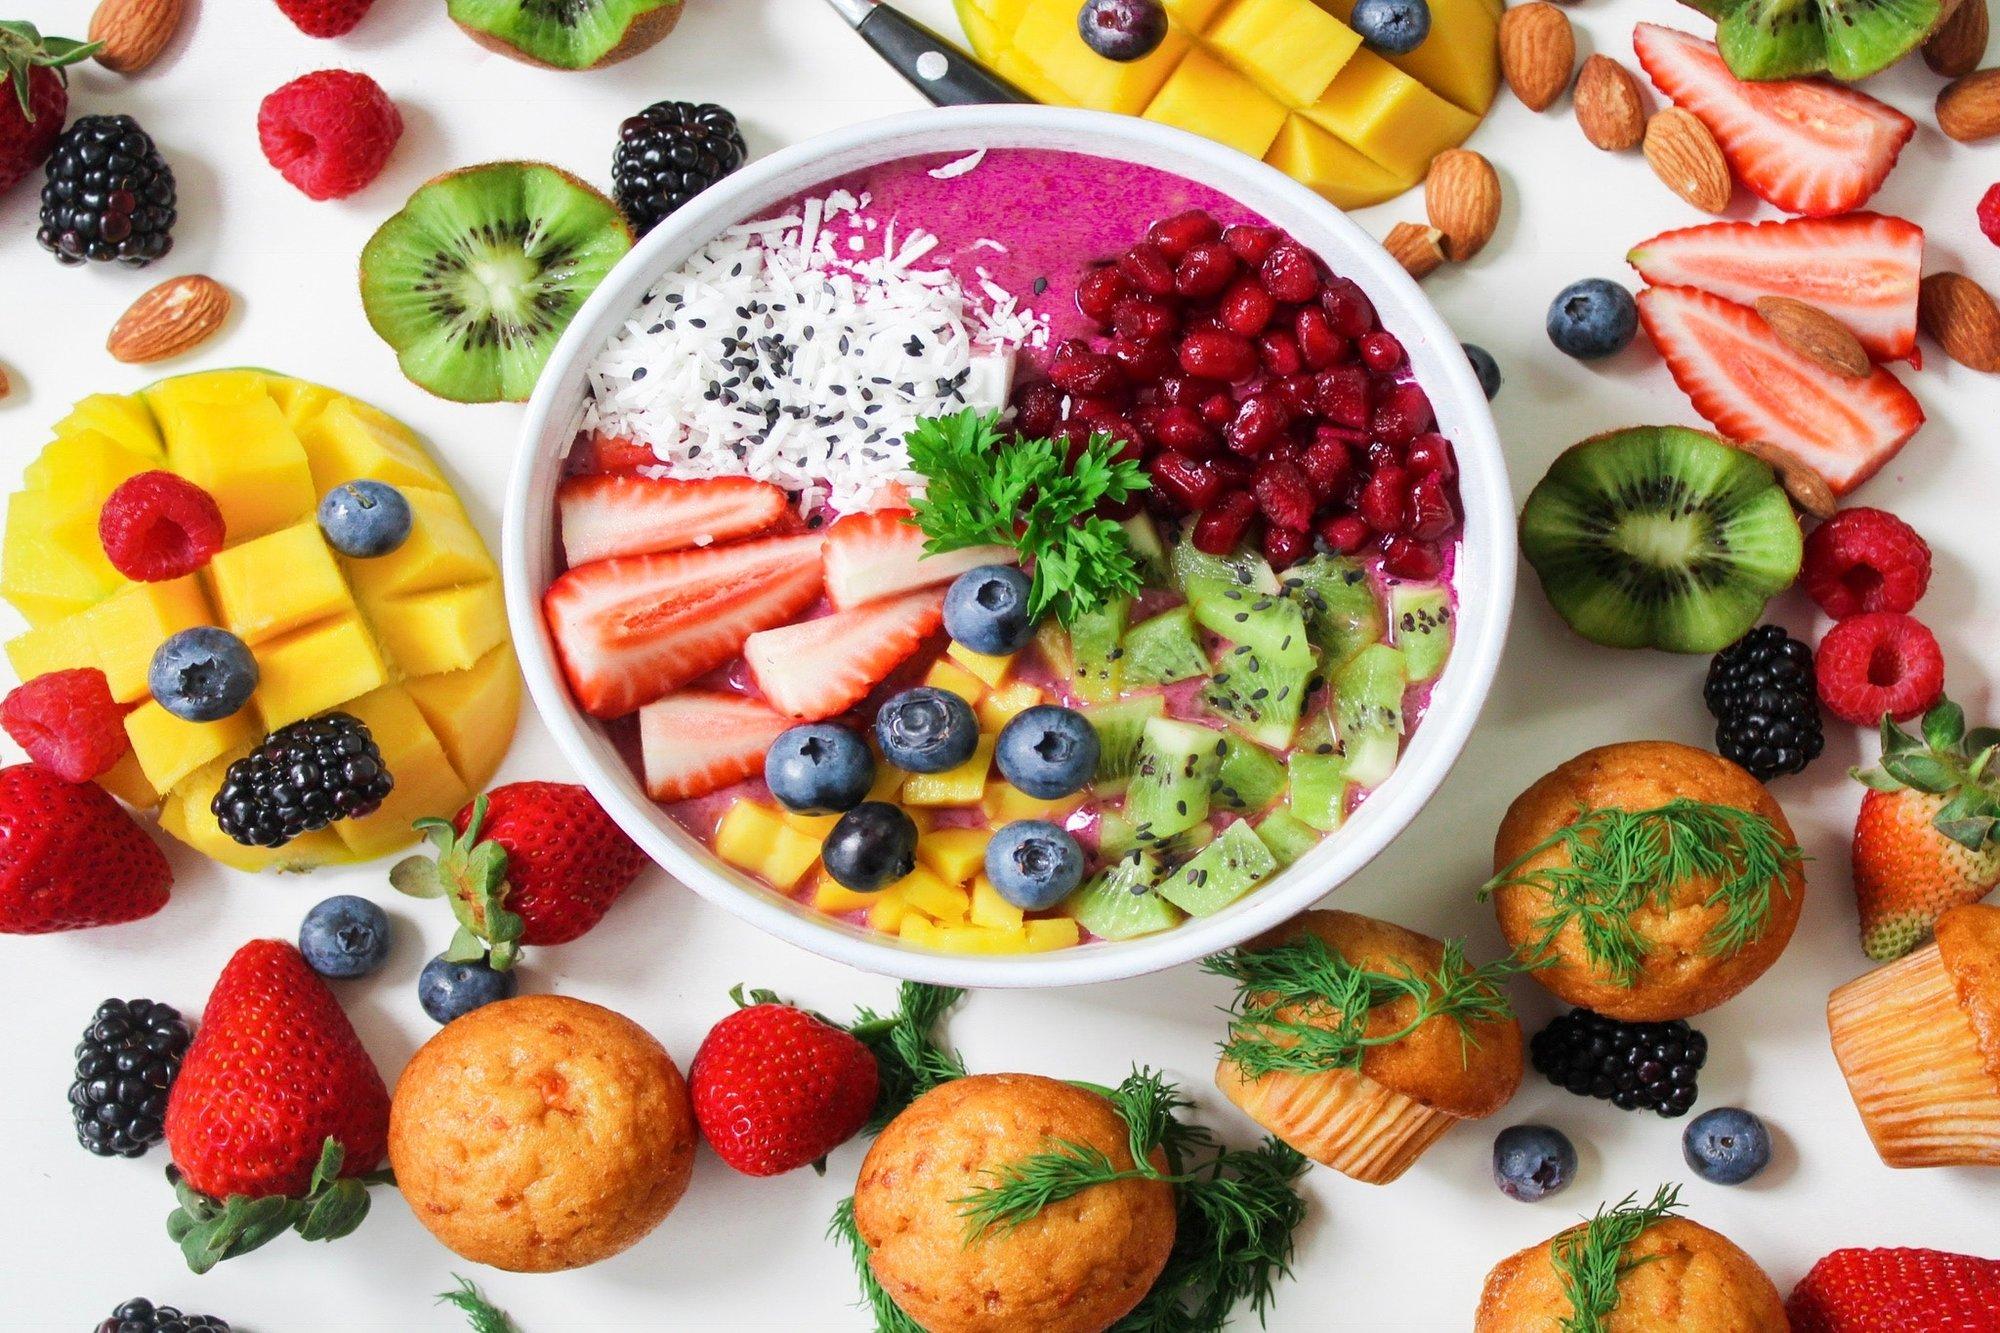 12 Trendy Organic Cafes in Seminyak